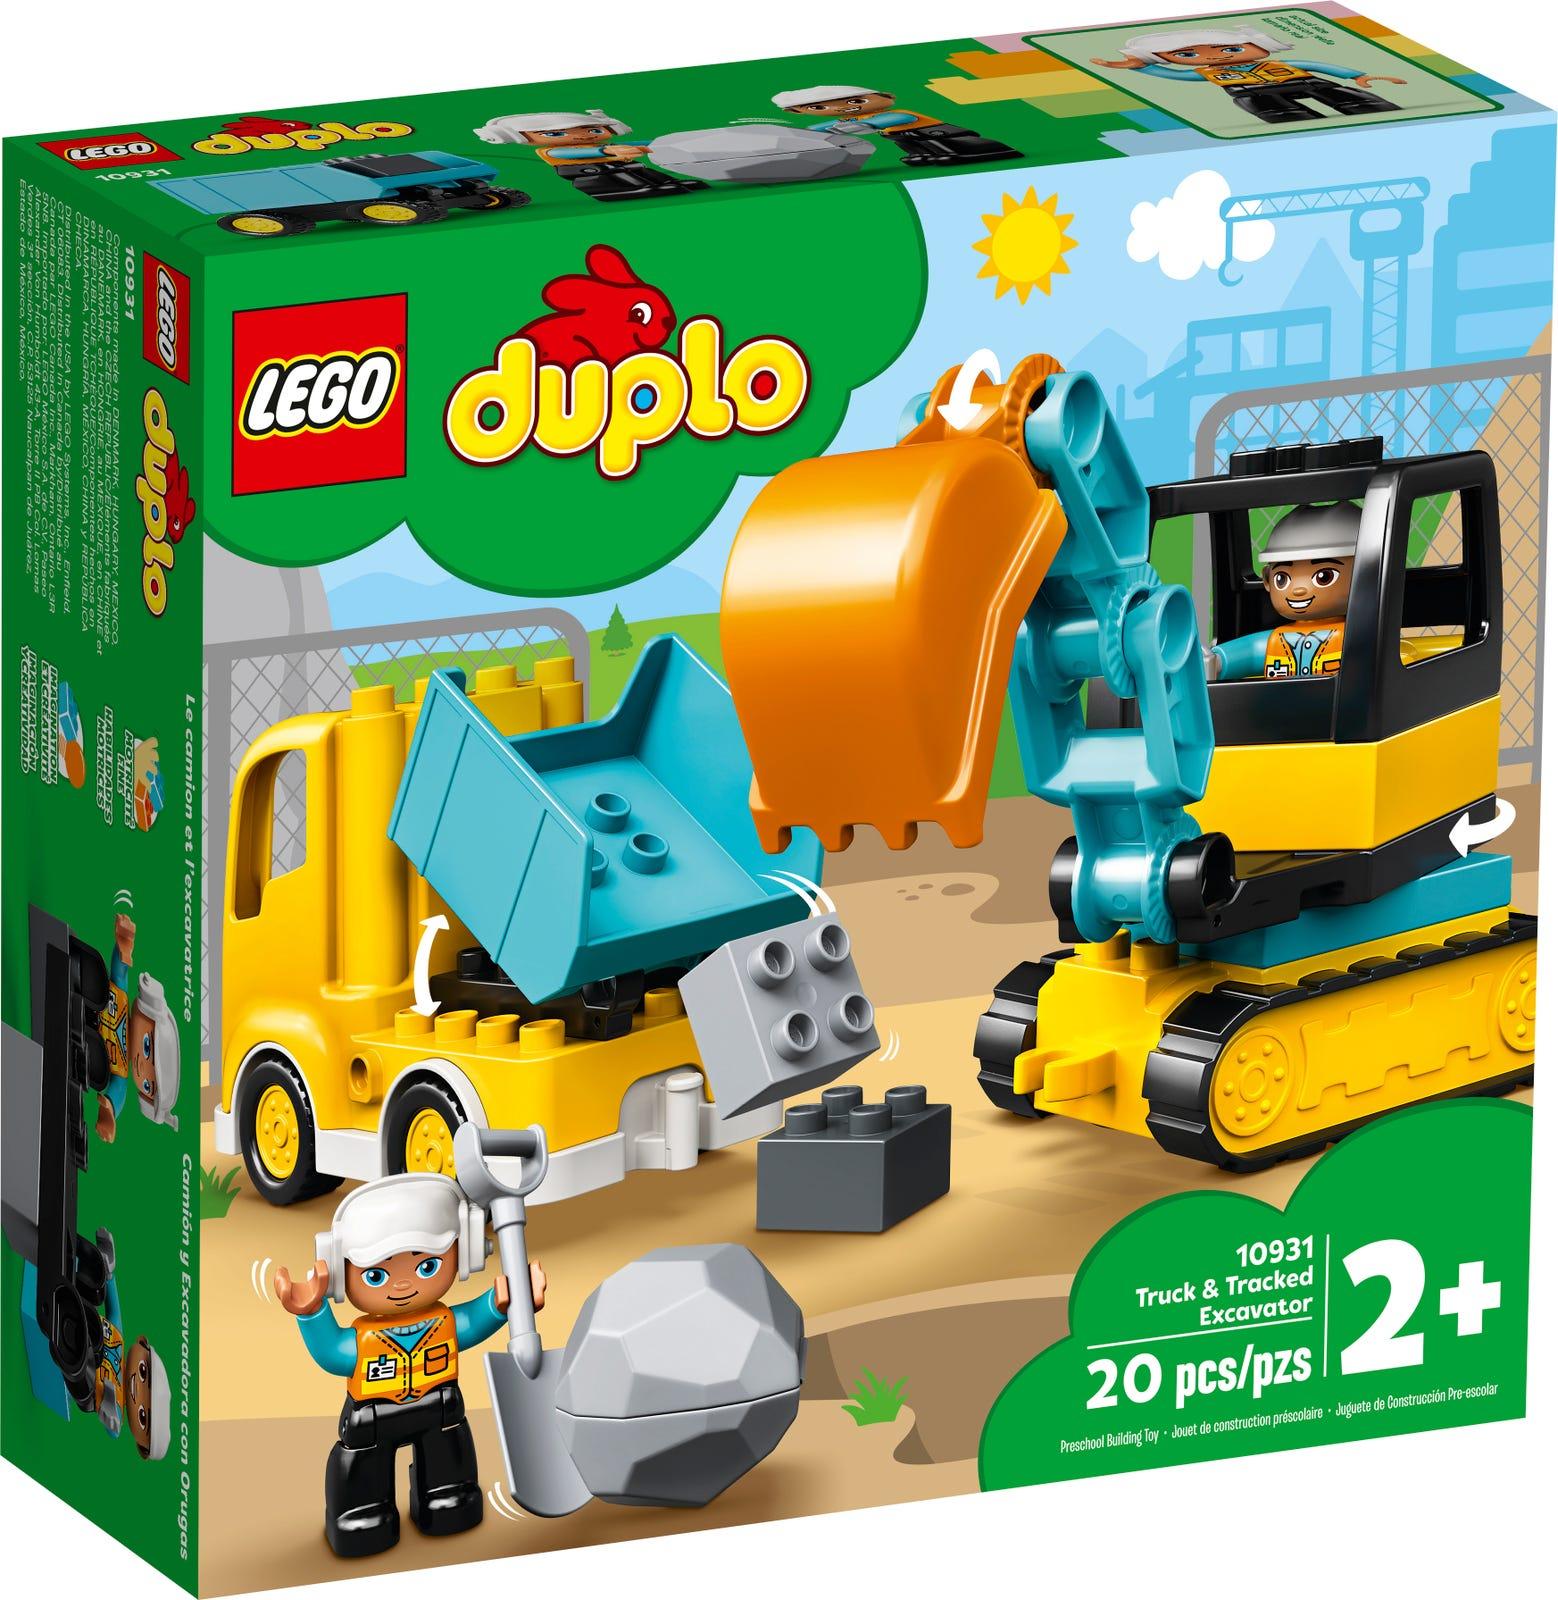 LEGO DUPLO CAMION E SCAVATRICE CINGOLATA 10931